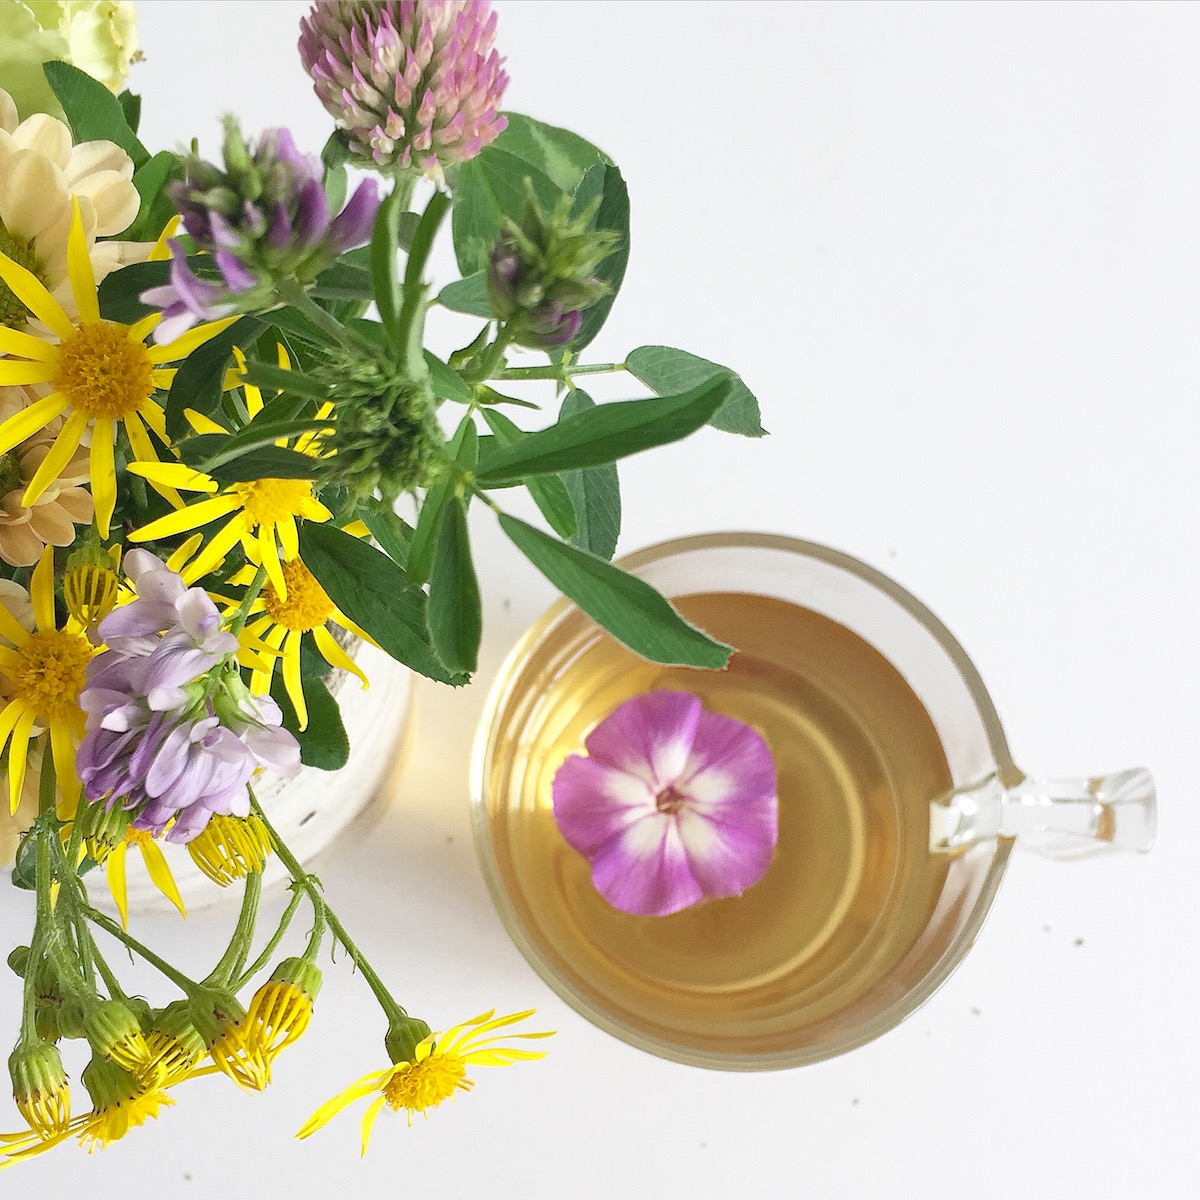 goodme beauty tea blumen sophiagaleria